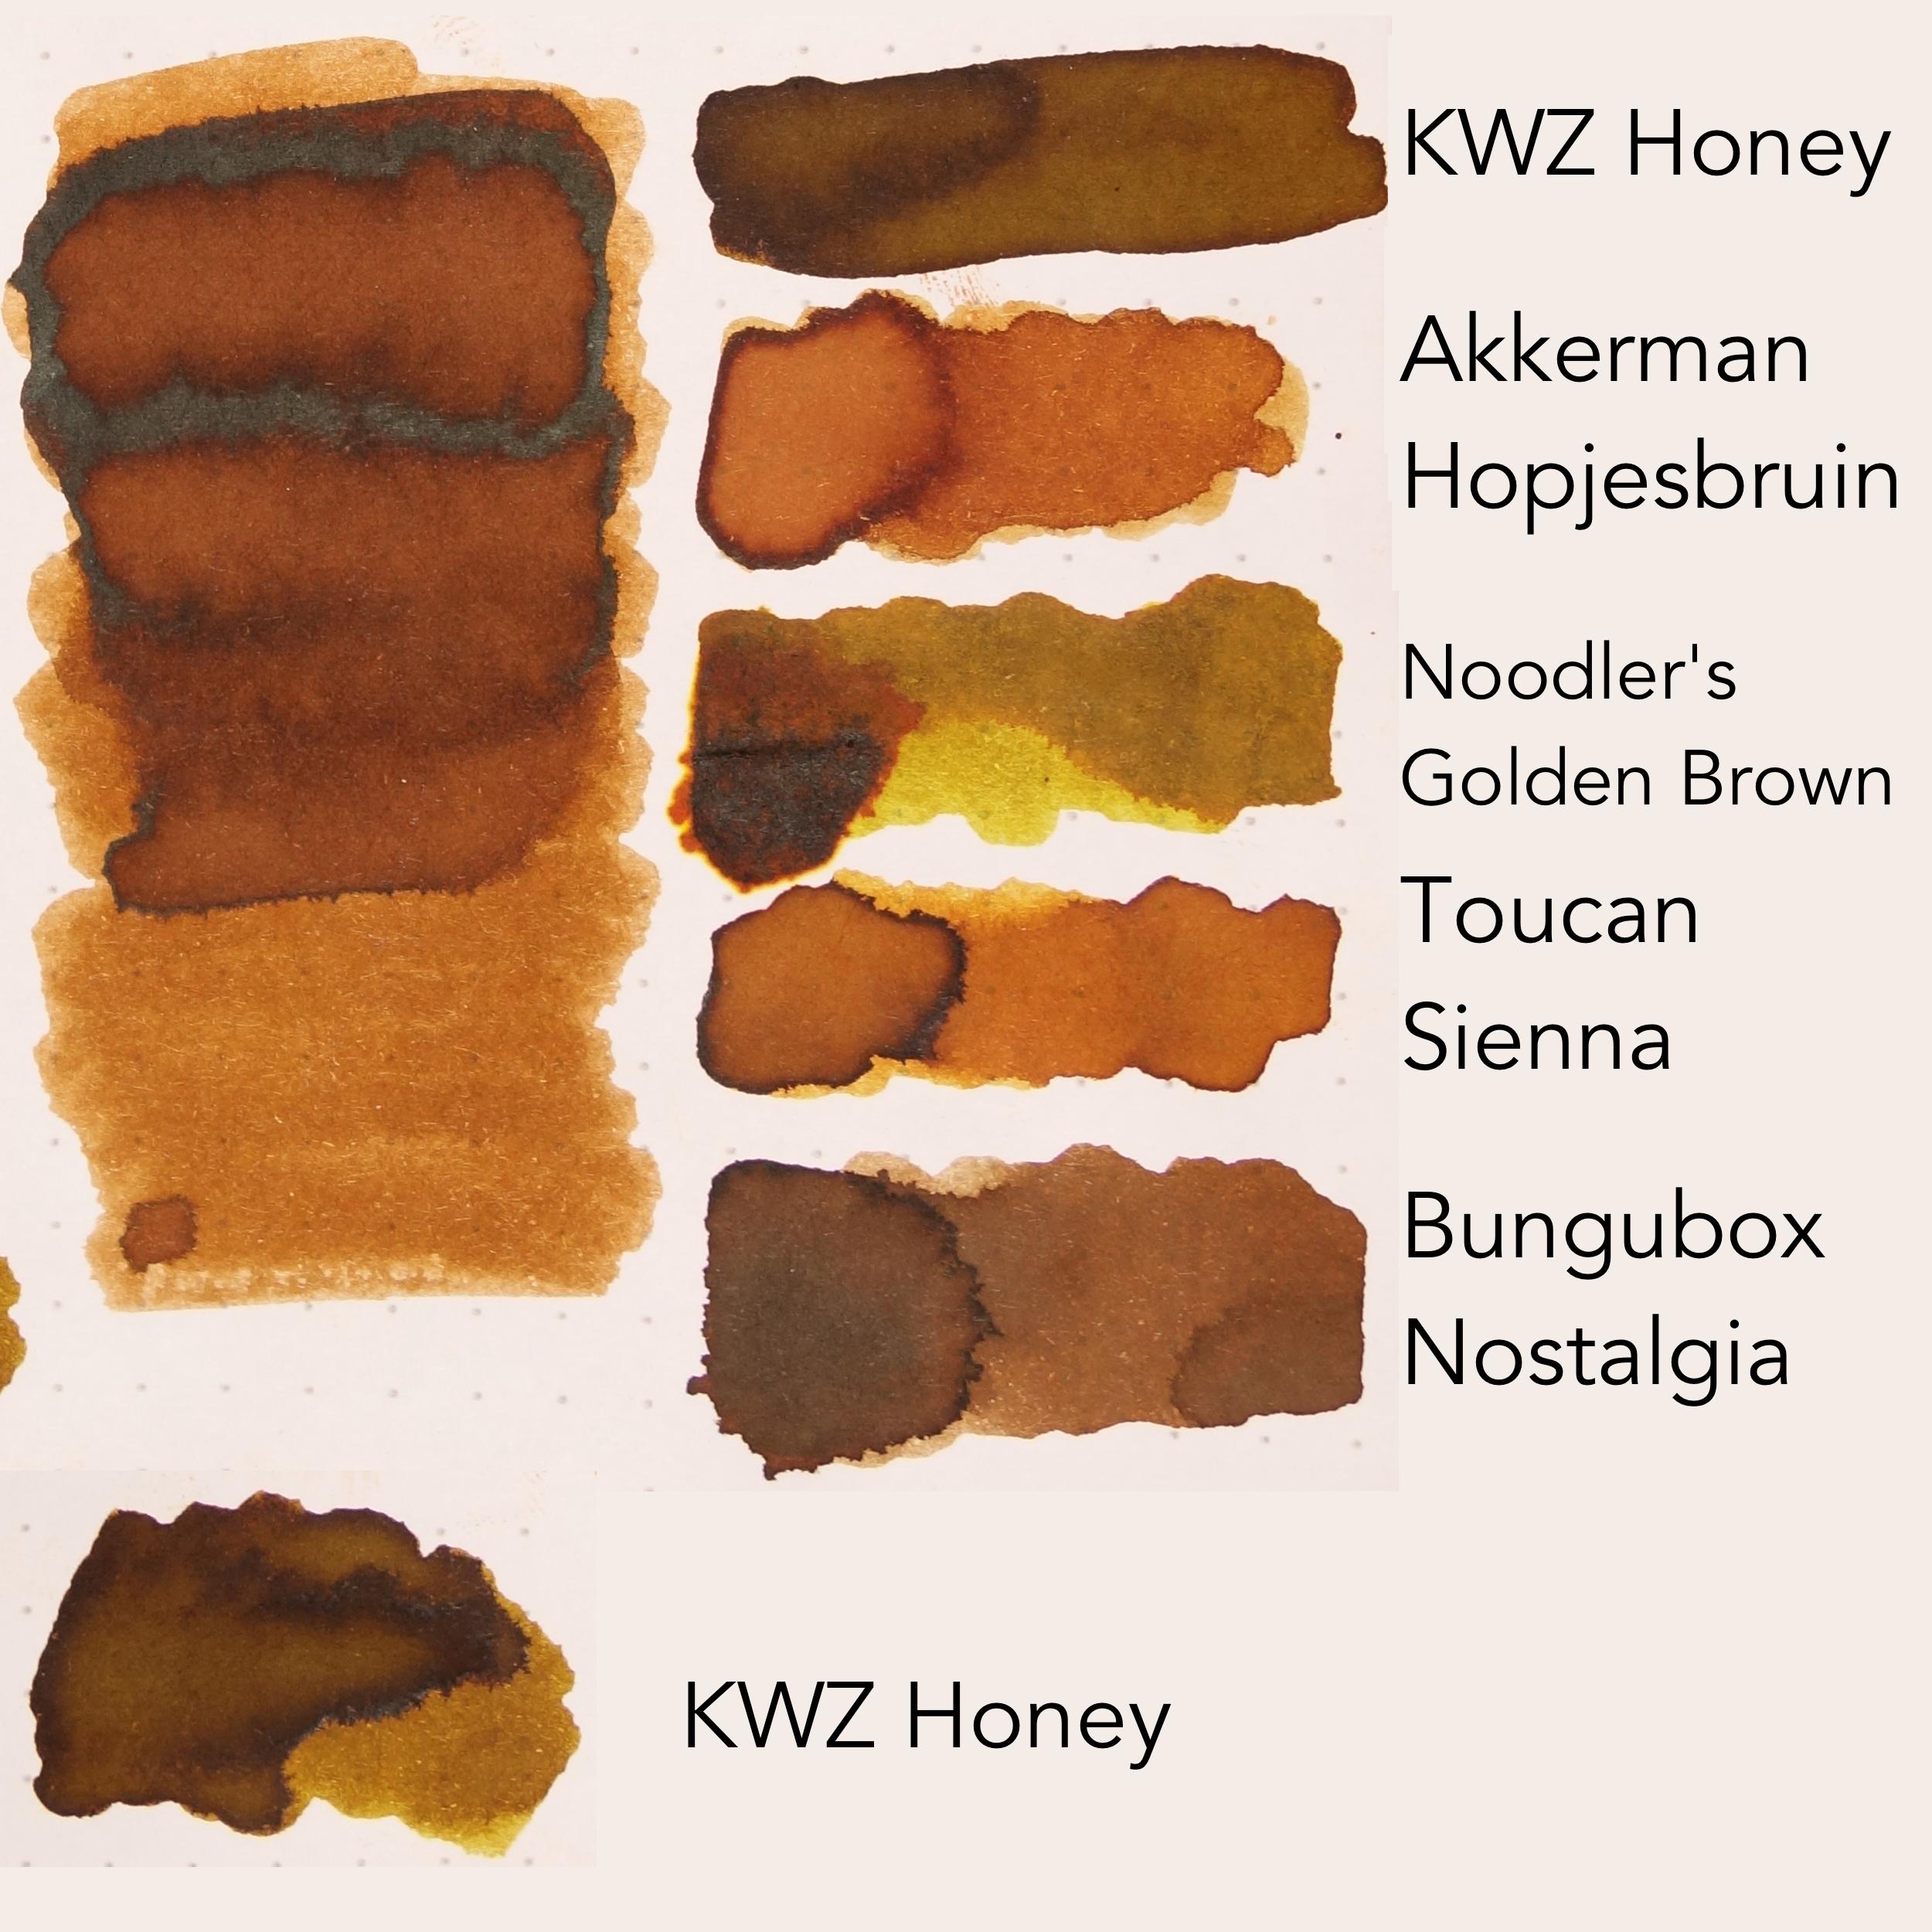 Top to bottom: KWZ Honey, Akkerman Hopjesbruin (or Diamine Sepia). Noodler's Golden Brown, Toucan Sienna,Bungubox Nostalgia and then KWZ Honey again,